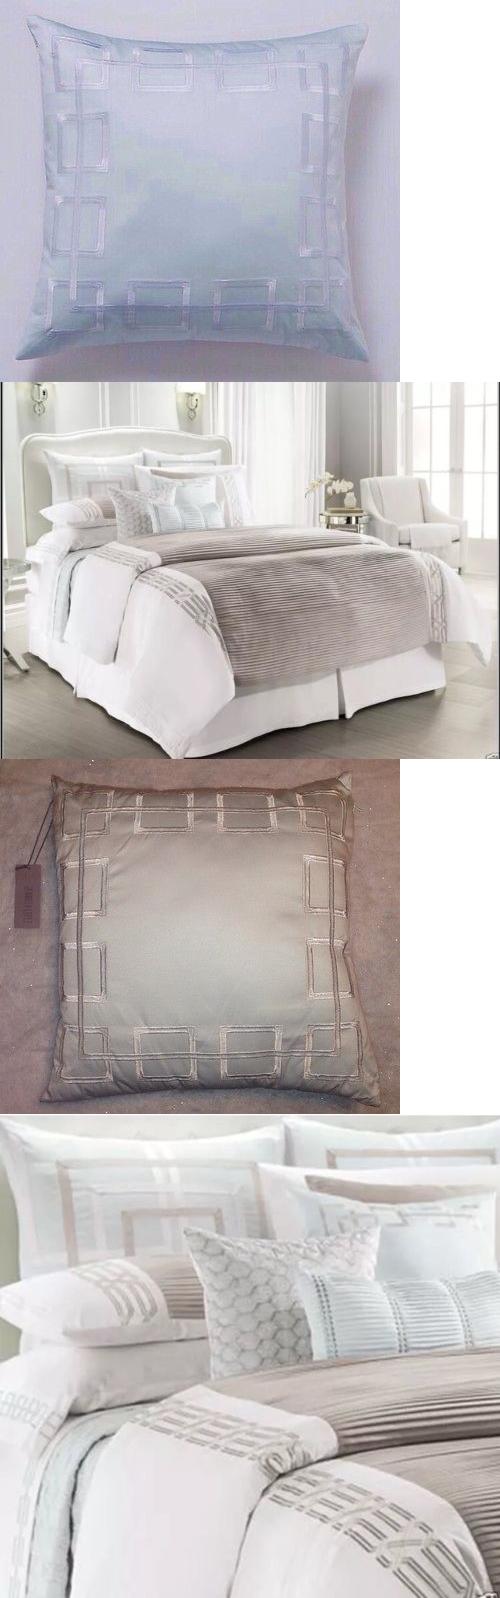 Blue decorative bed pillows - Decorative Bed Pillows 115630 New Jlo Jennifer Lopez Escape Decorative Throw Pillow 18x18 Icy Blue